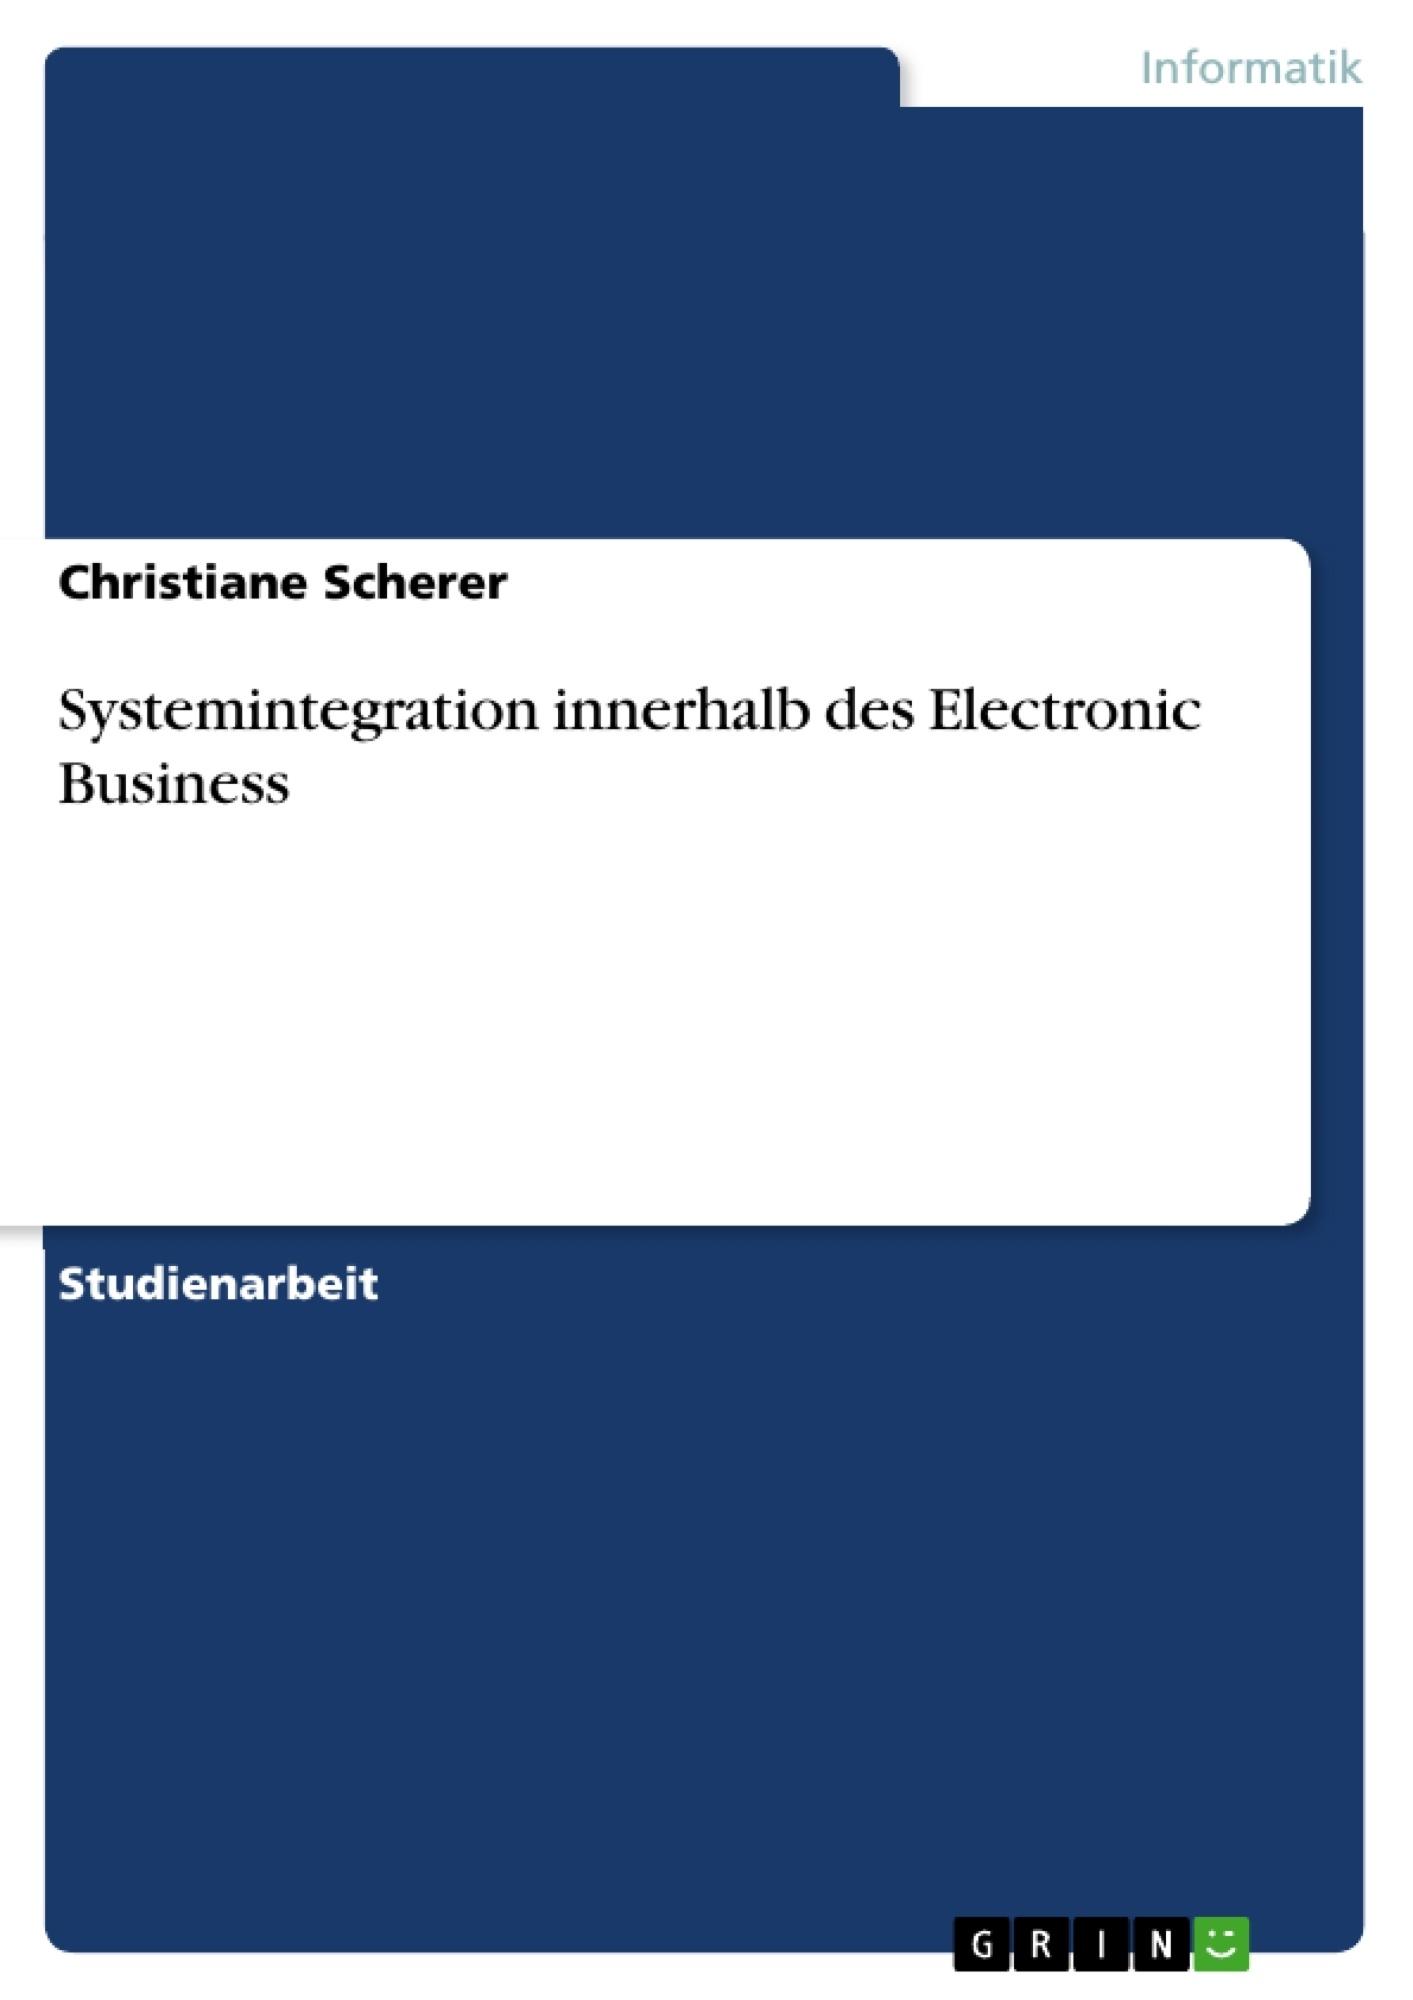 Titel: Systemintegration innerhalb des Electronic Business